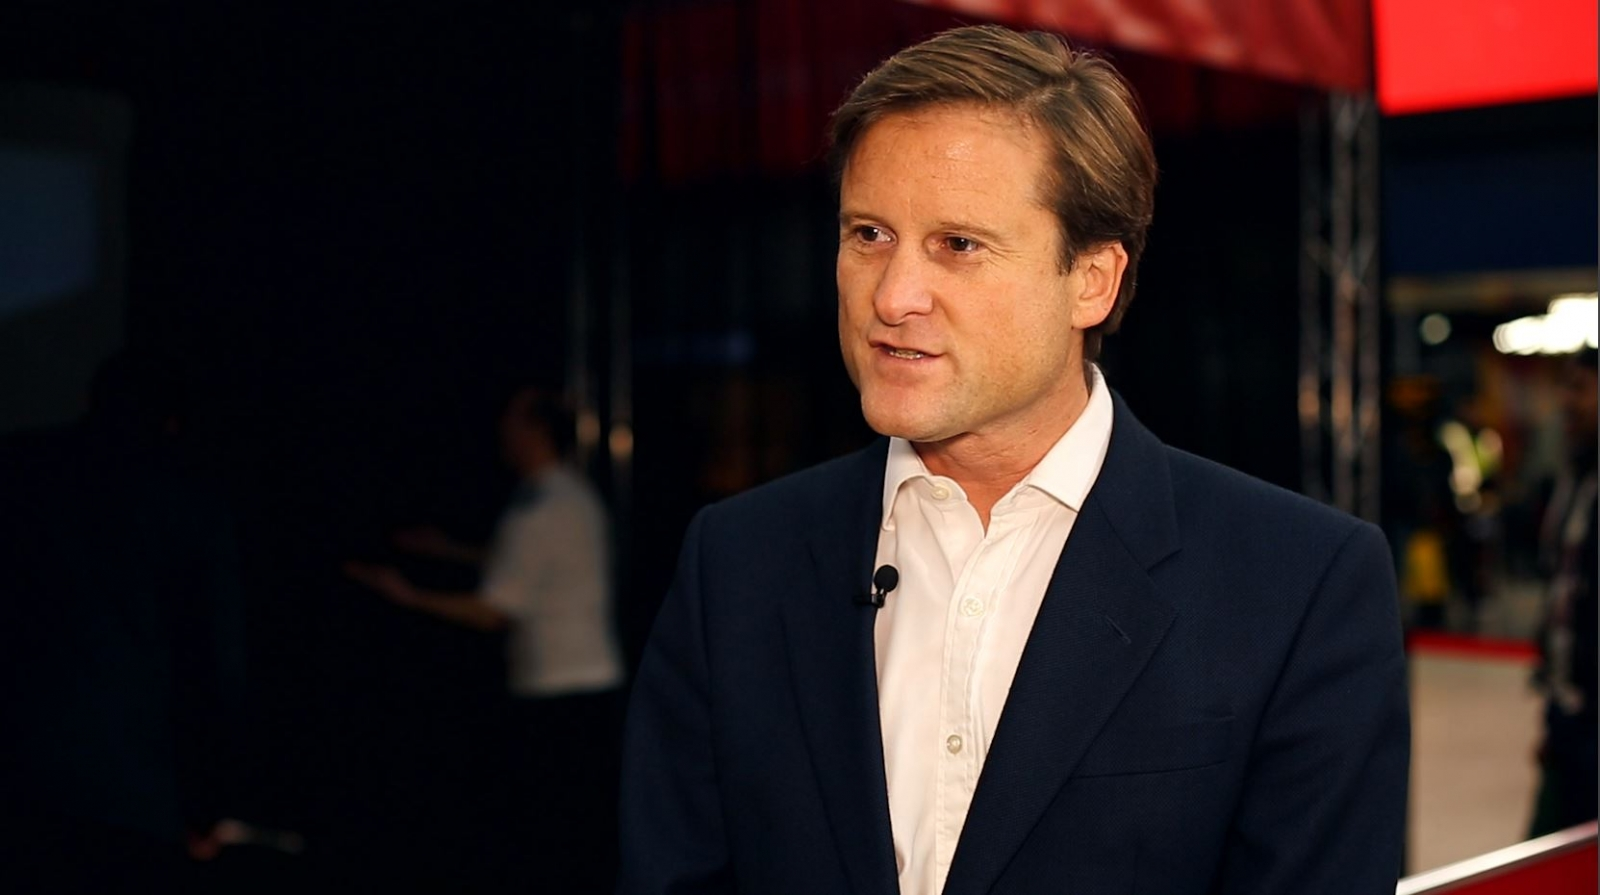 Chris Hill CFO at IG Group speaks to IBTimes TV